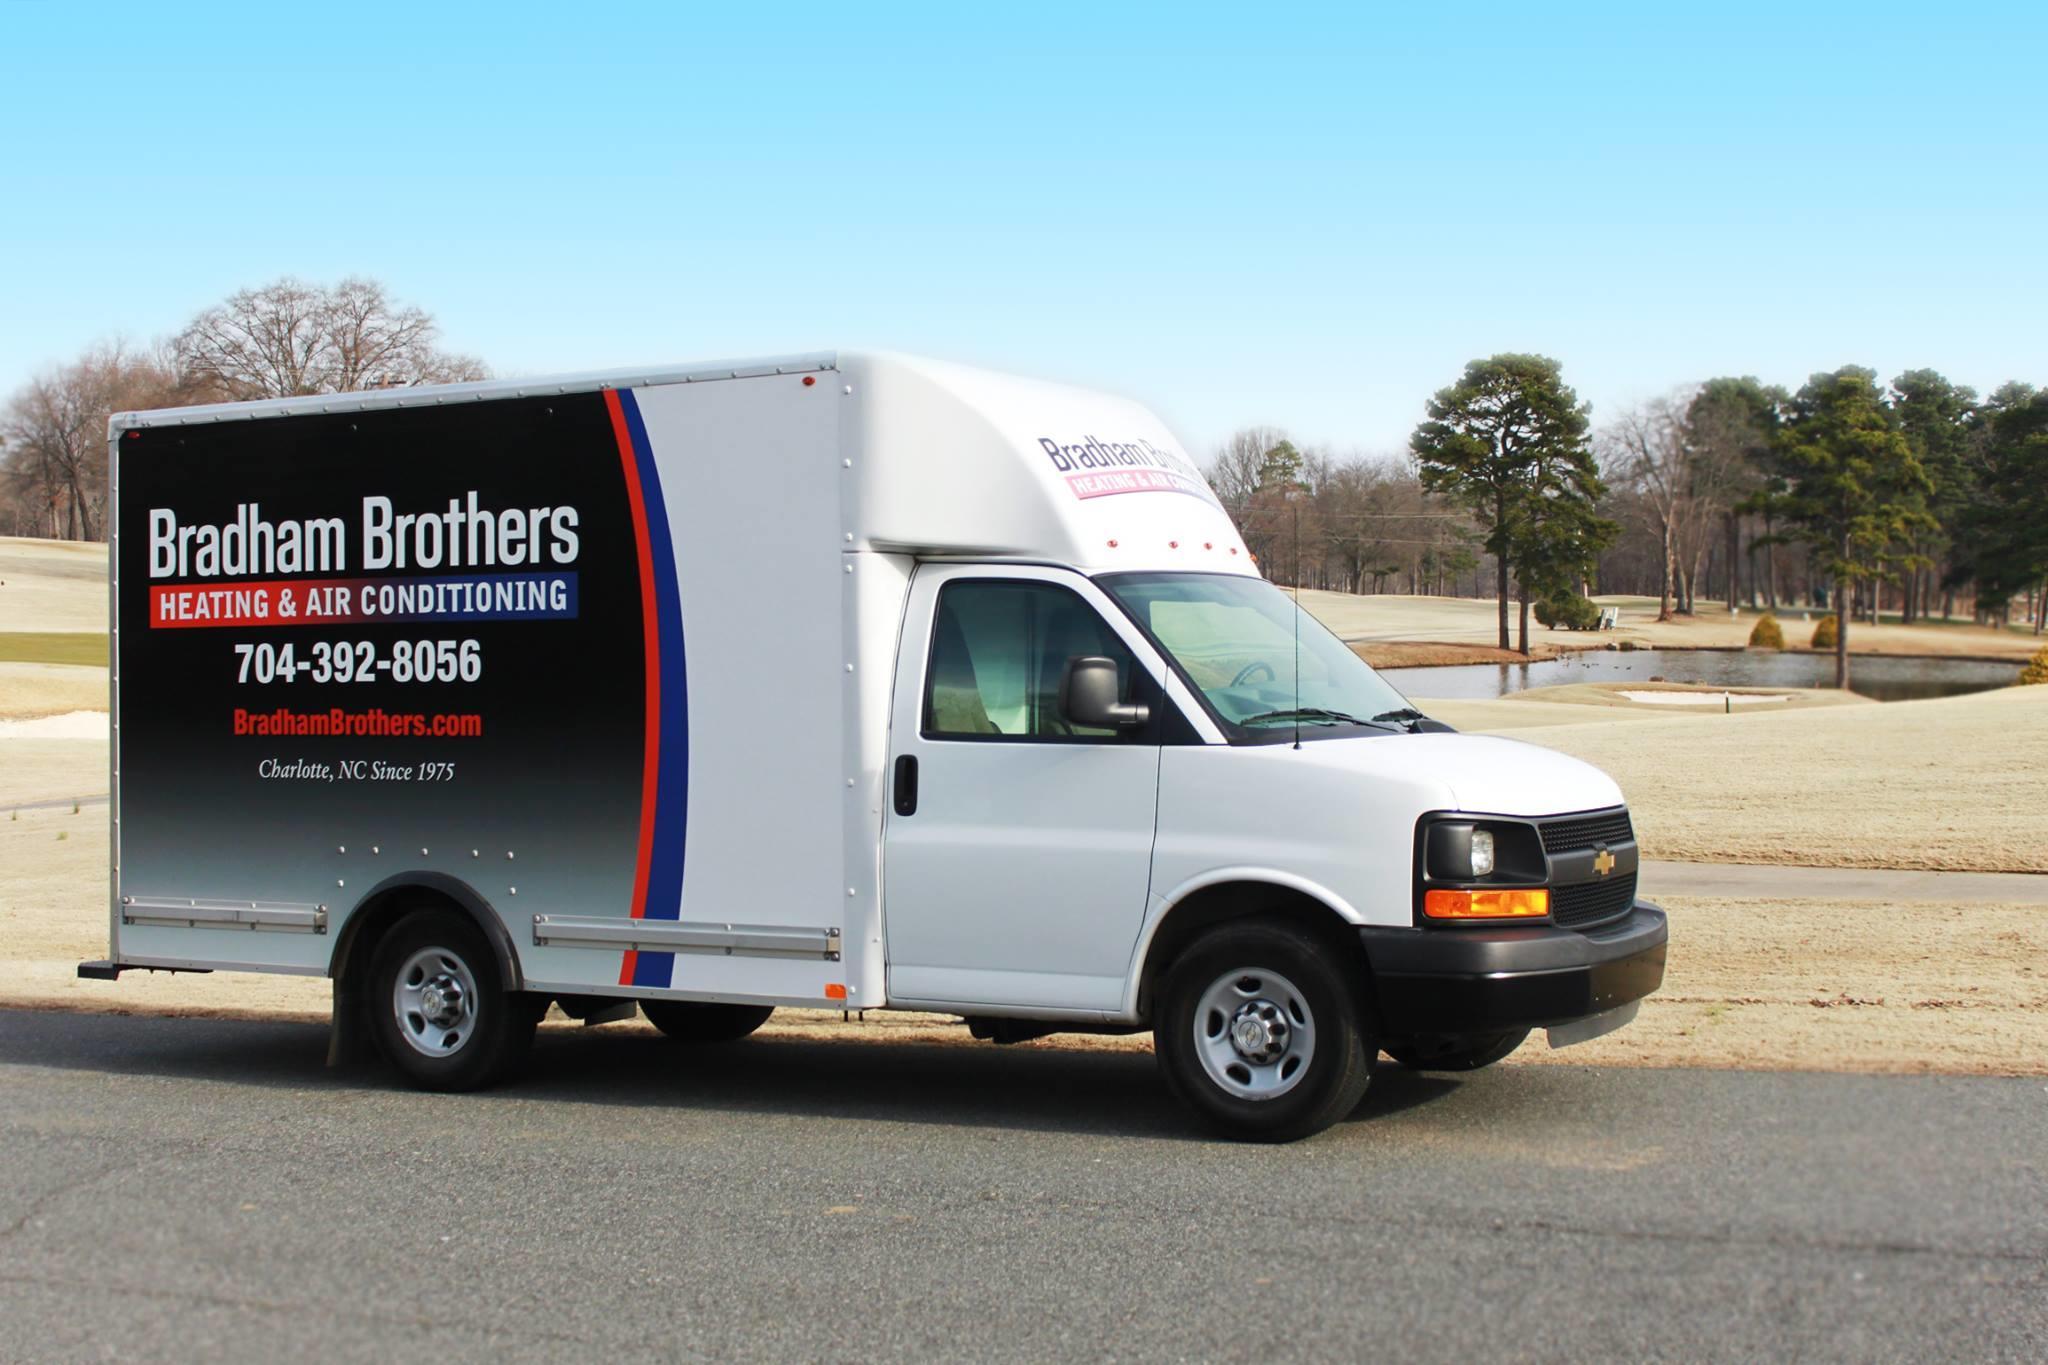 Bradham Brothers, Inc. image 2